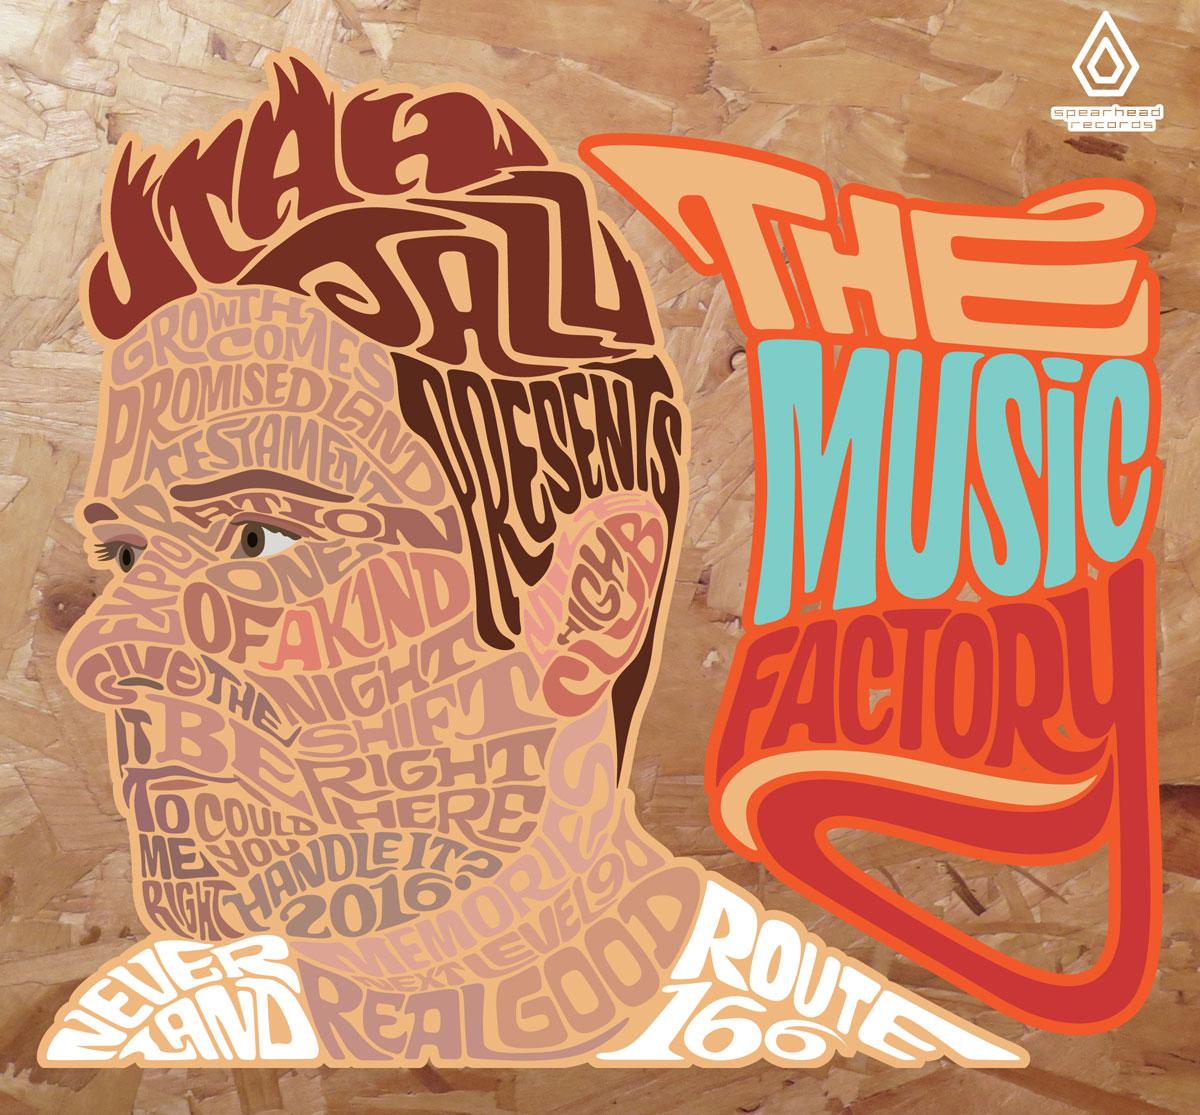 Studio Oscar - THE MUSIC FACTORY LP